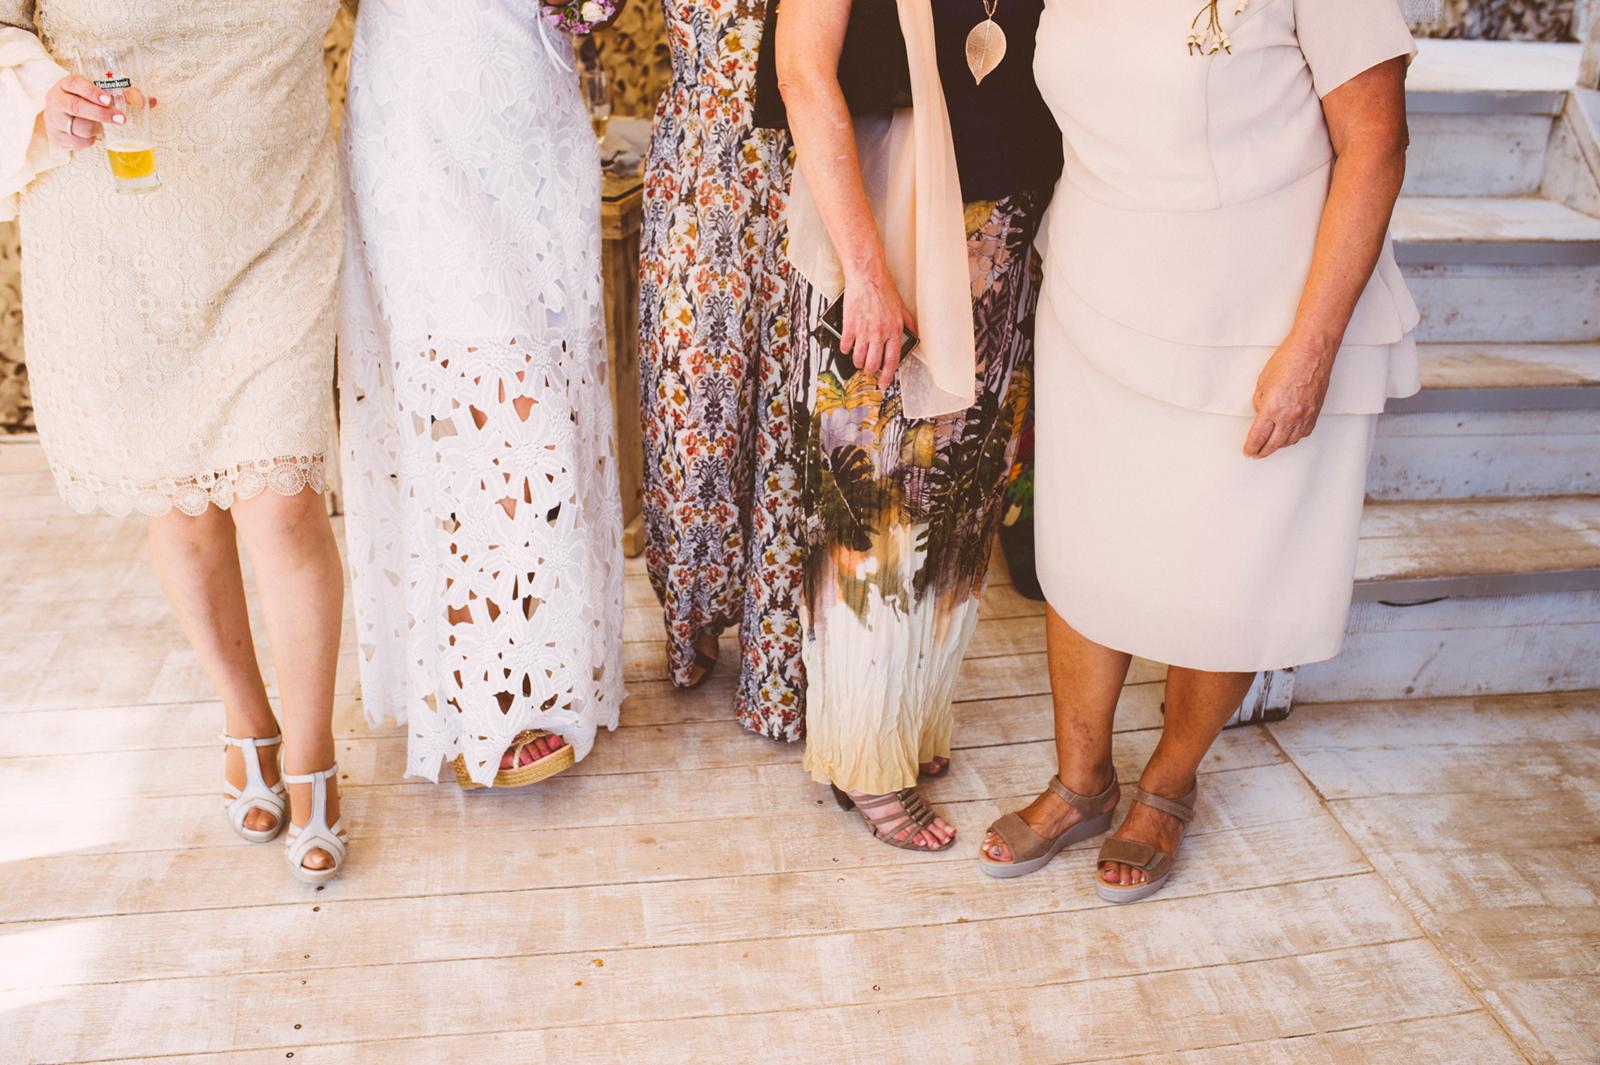 Hochzeitsfotograf_Ibiza_098.jpg